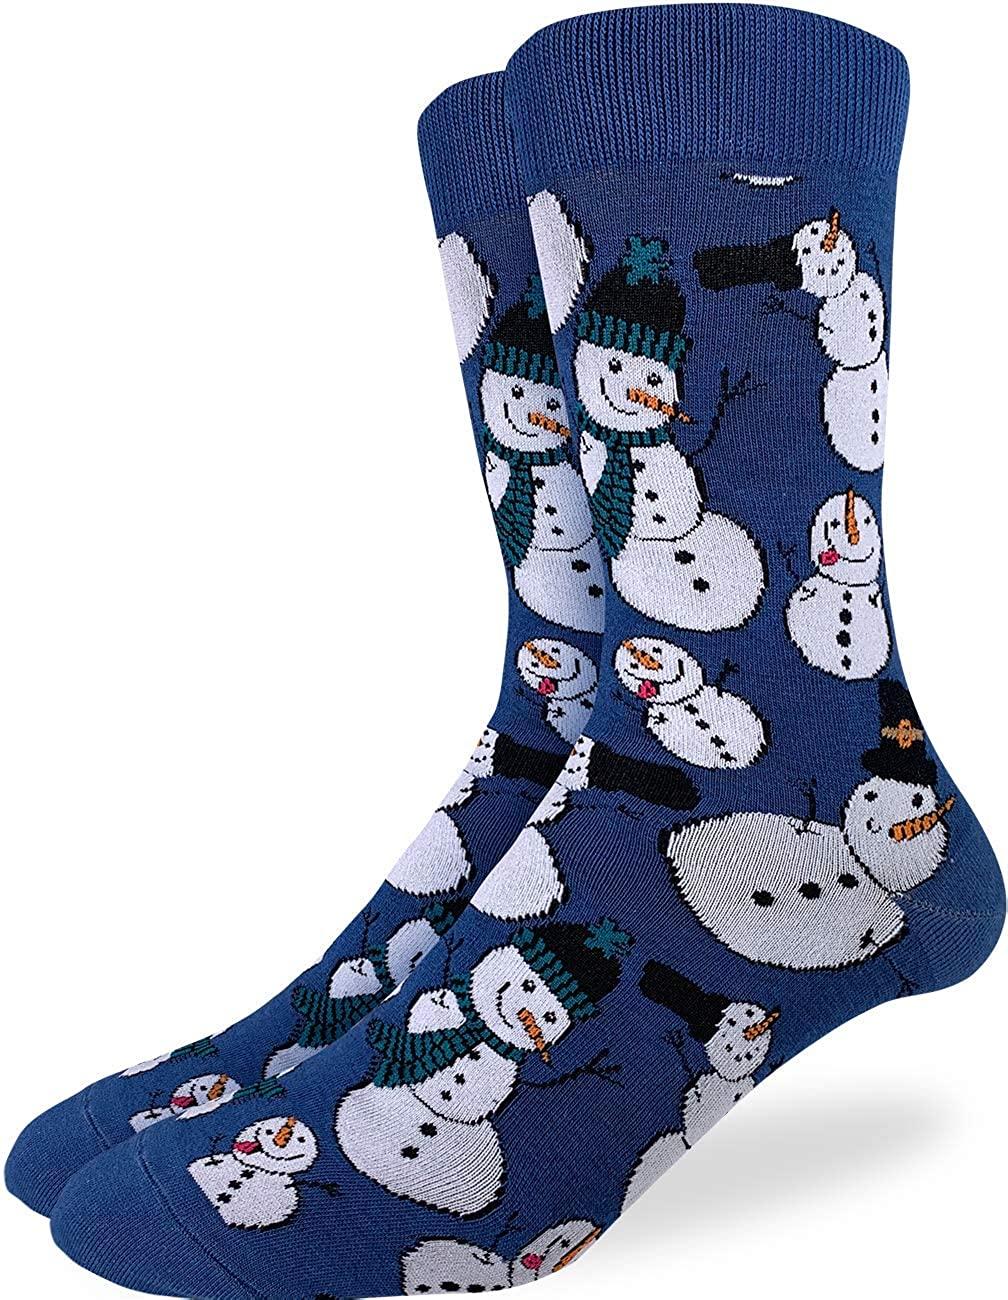 Good Luck Sock Men's Snowmen Socks - Blue, Adult Shoe Size 7-12